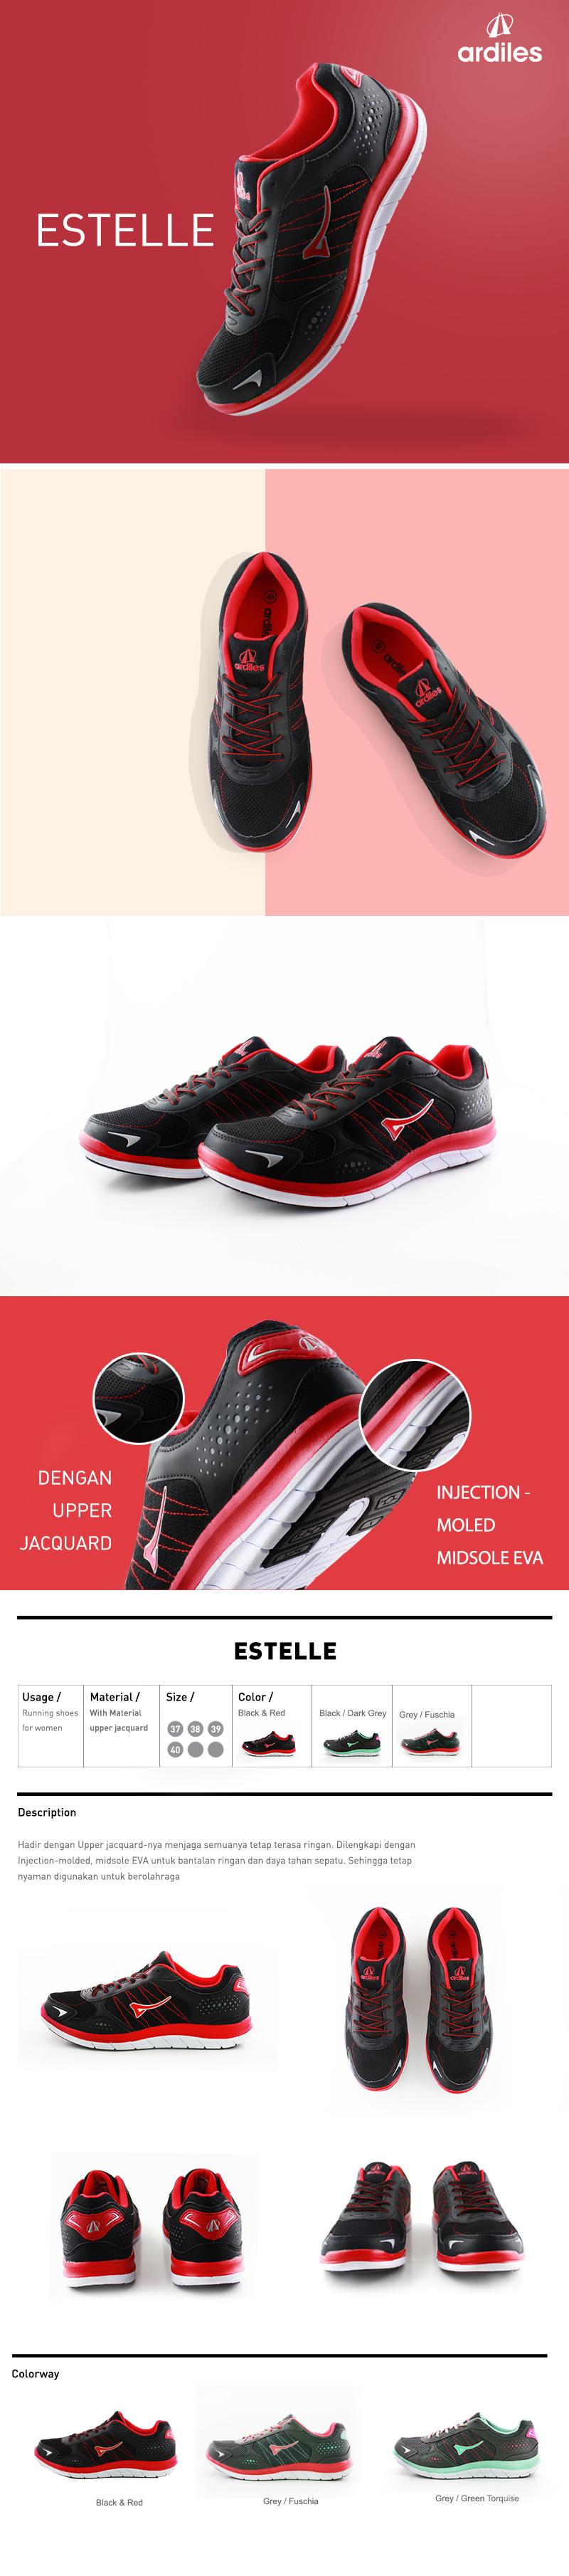 Harga Ardiles Fg Teaberry 01 Women Running Shoes Abu Muda 37 Men Articuno Grey Black 41 Estelle Hitam Merah Woman Daftar Terbaru